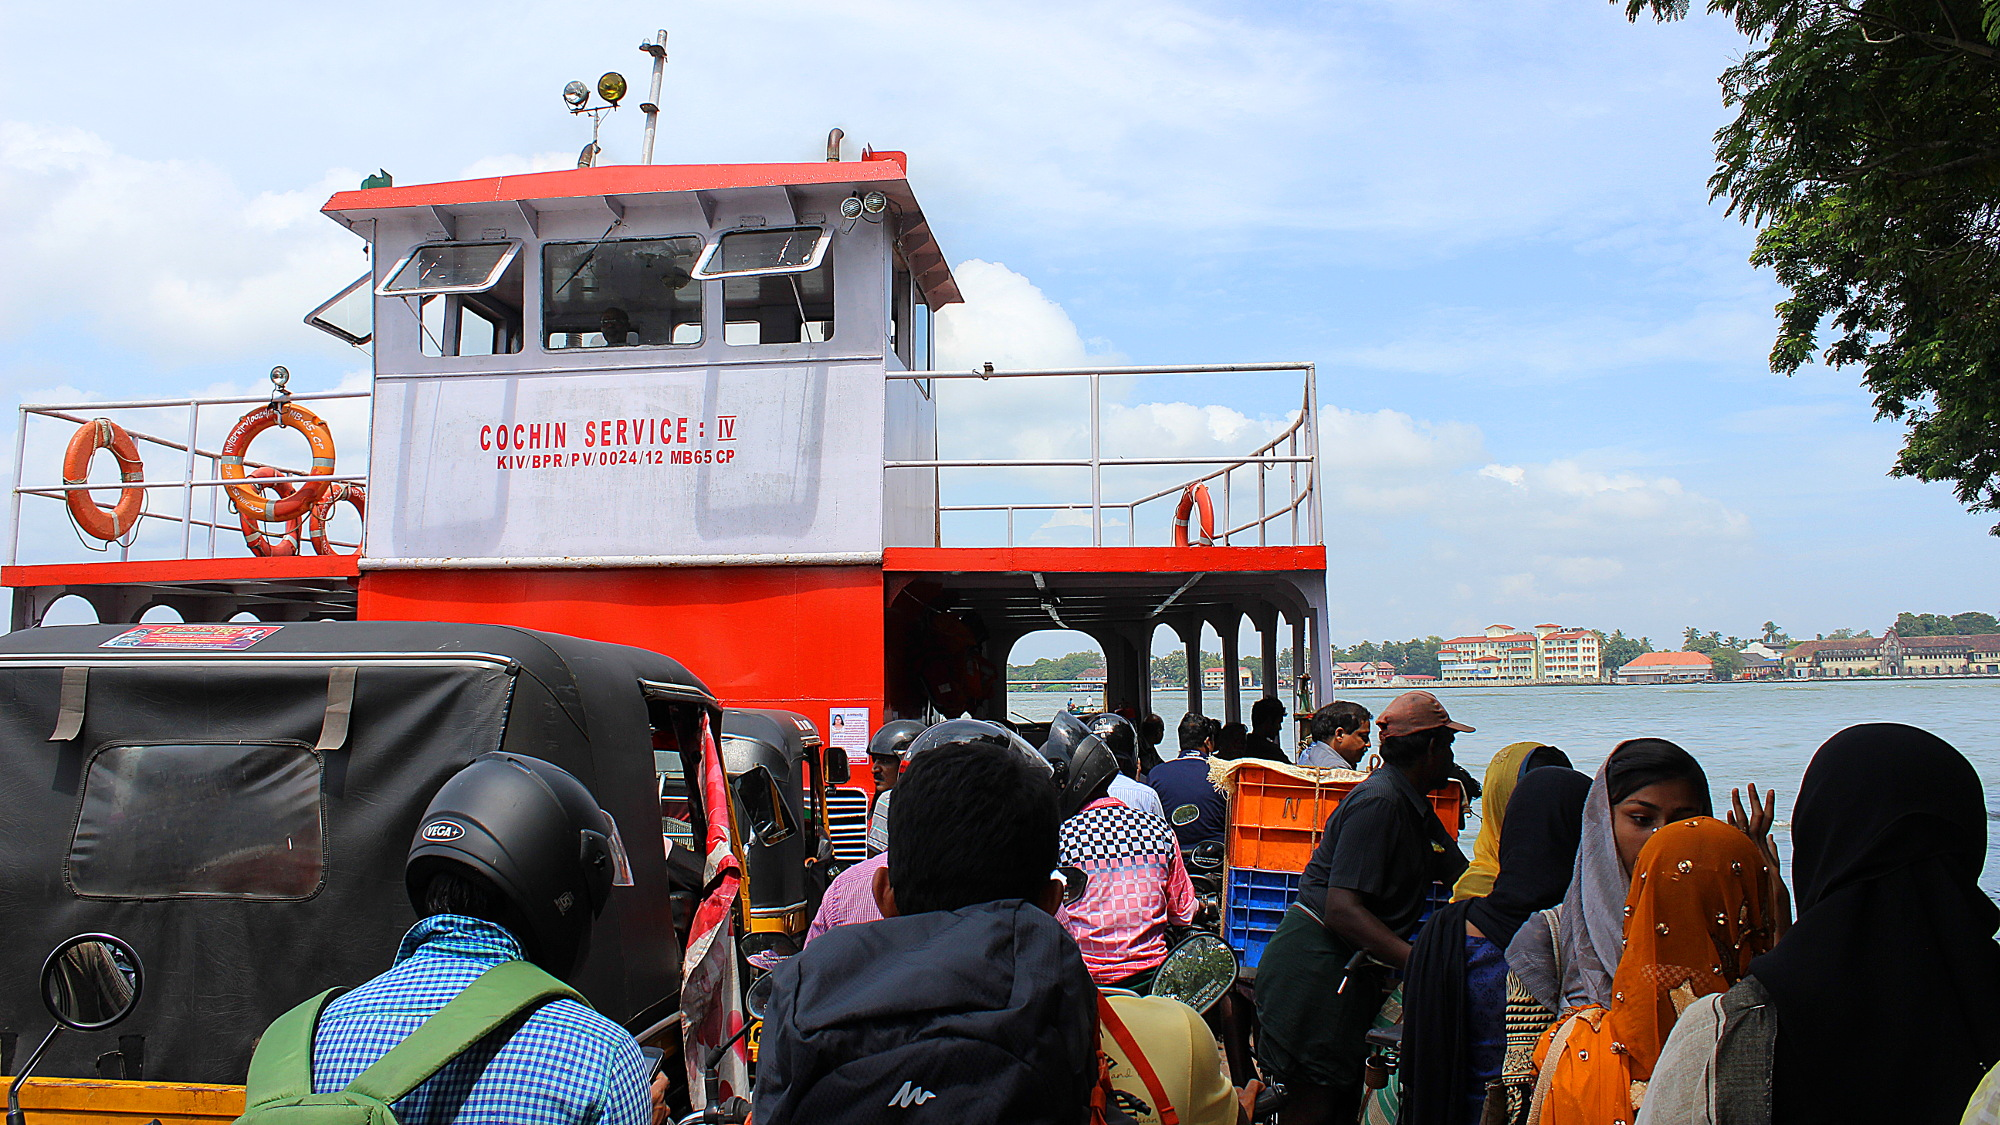 Cochin Service ferry to Fort Kochi, the touristy island of Kochi.